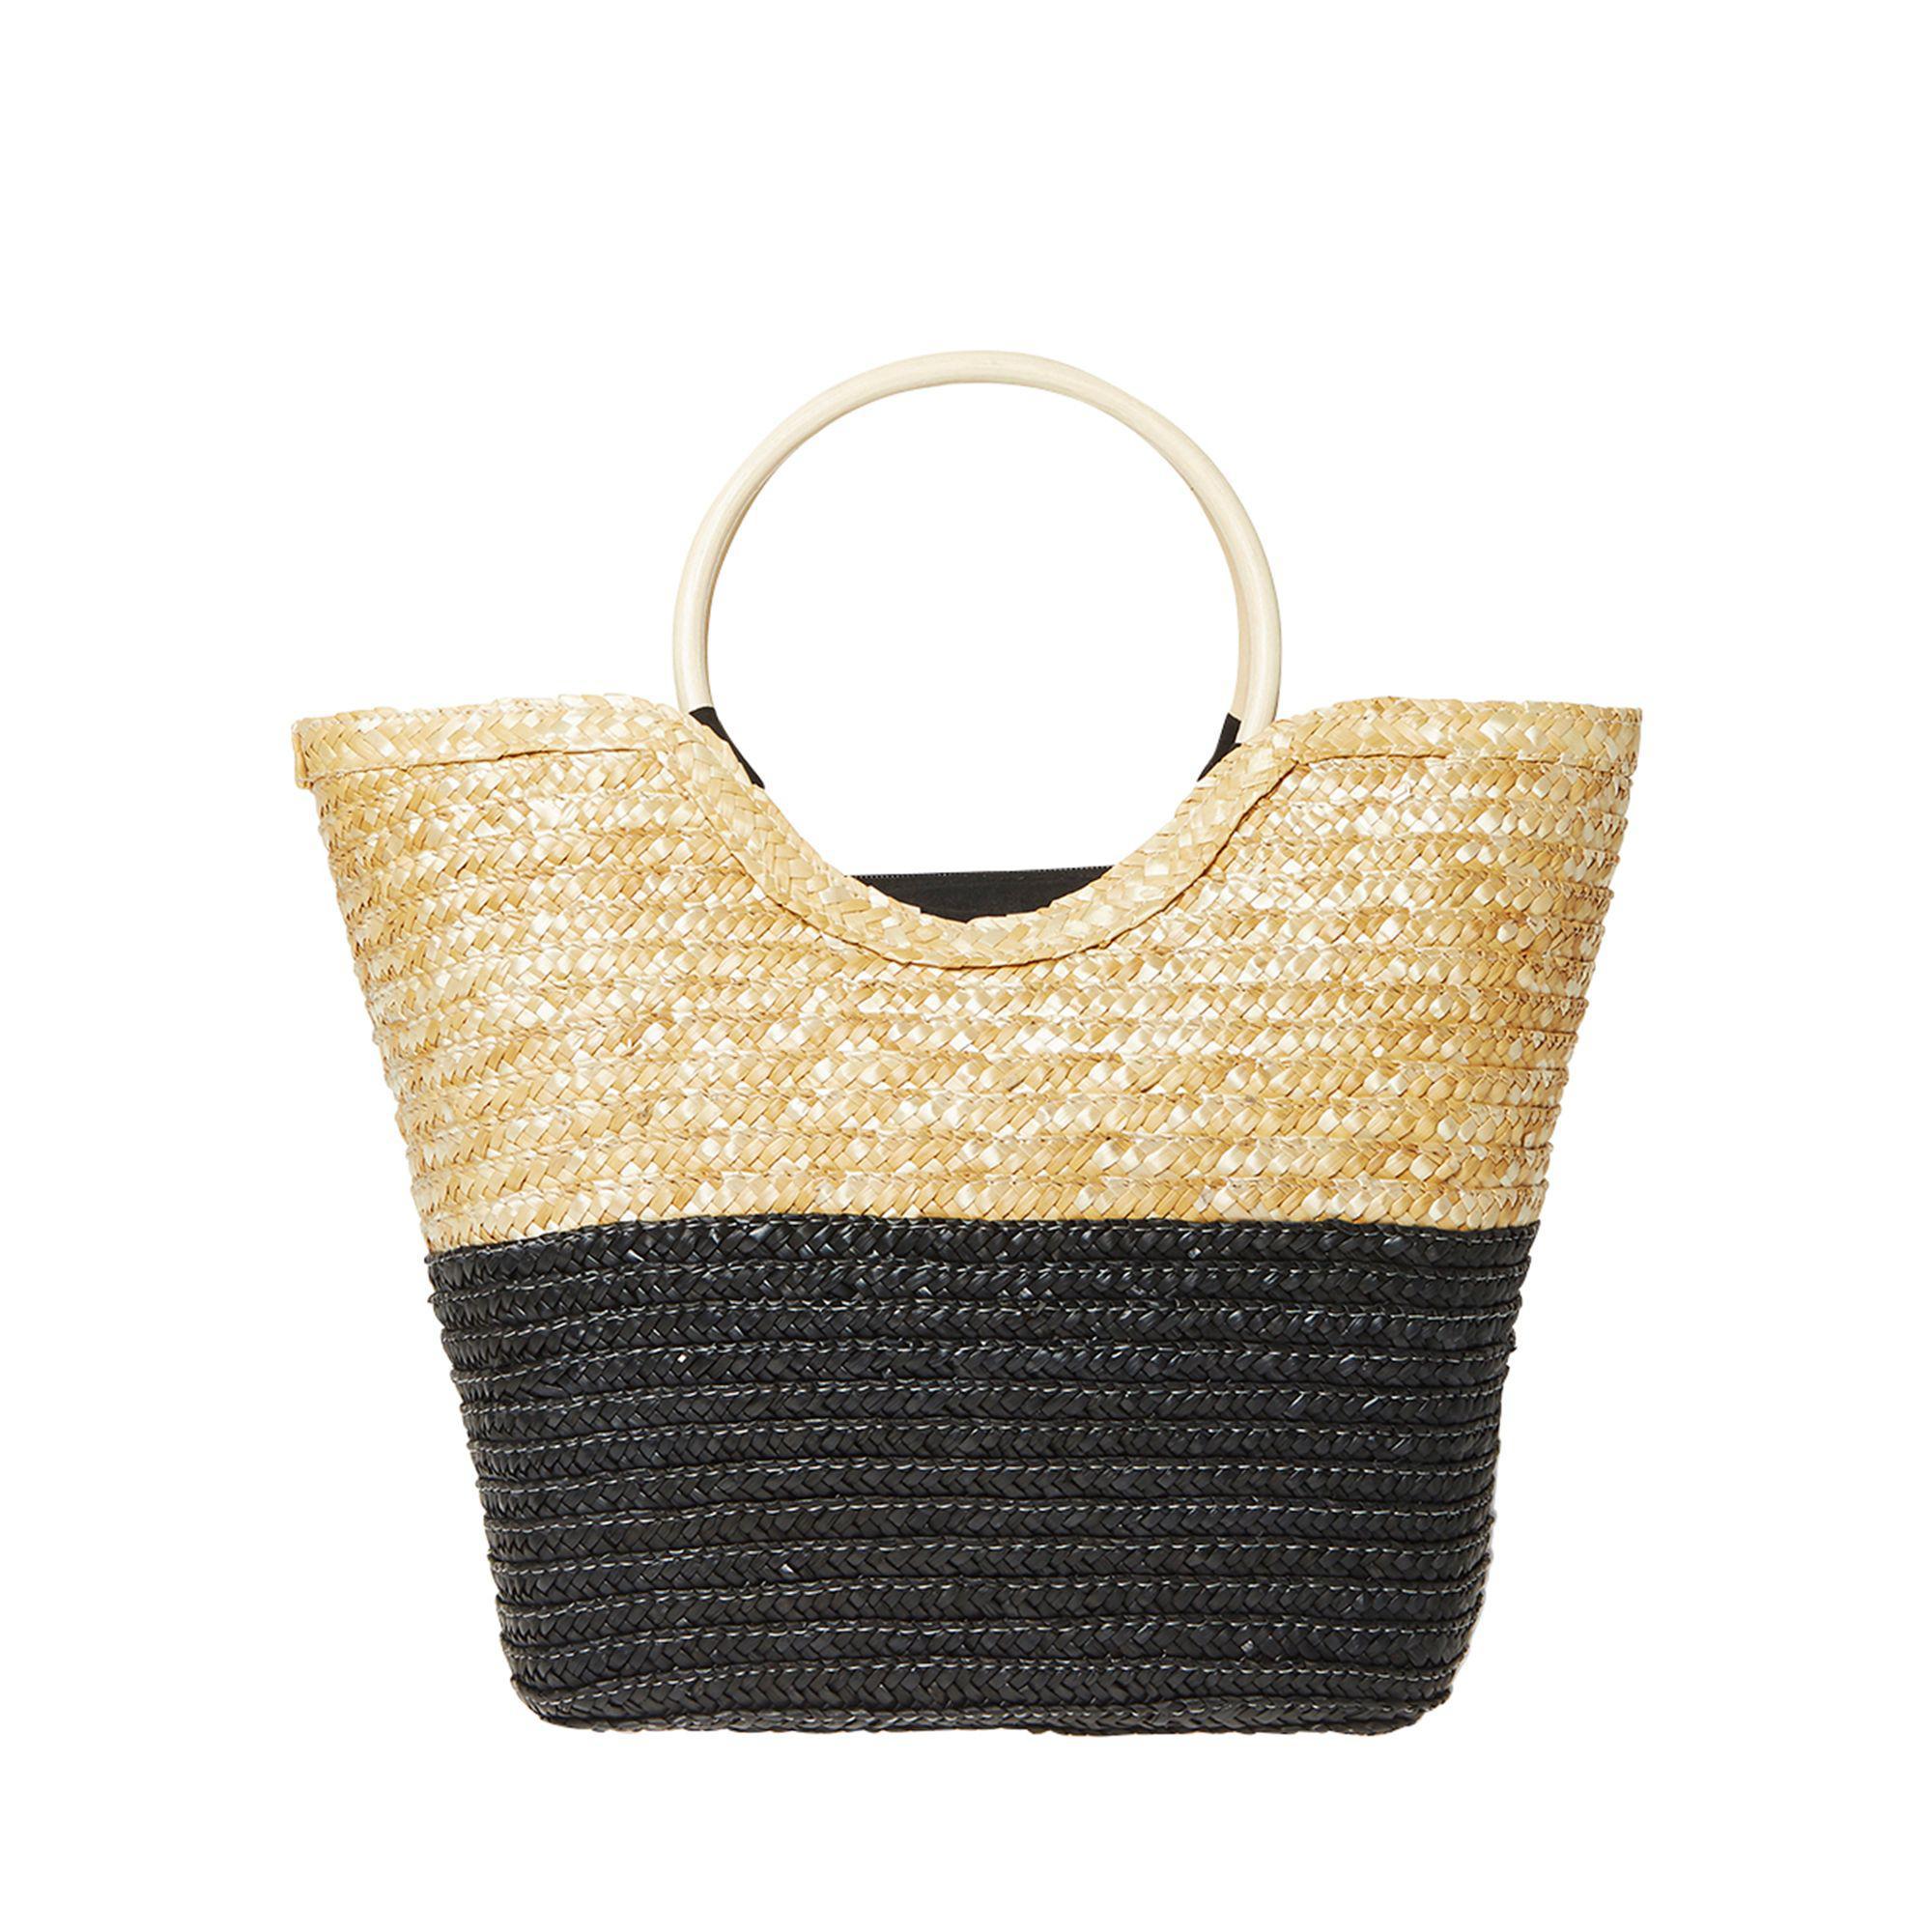 659ecac86a14 Dorothy Perkins Multi Coloured Wooden Hoop Handle Beach Bag in White ...